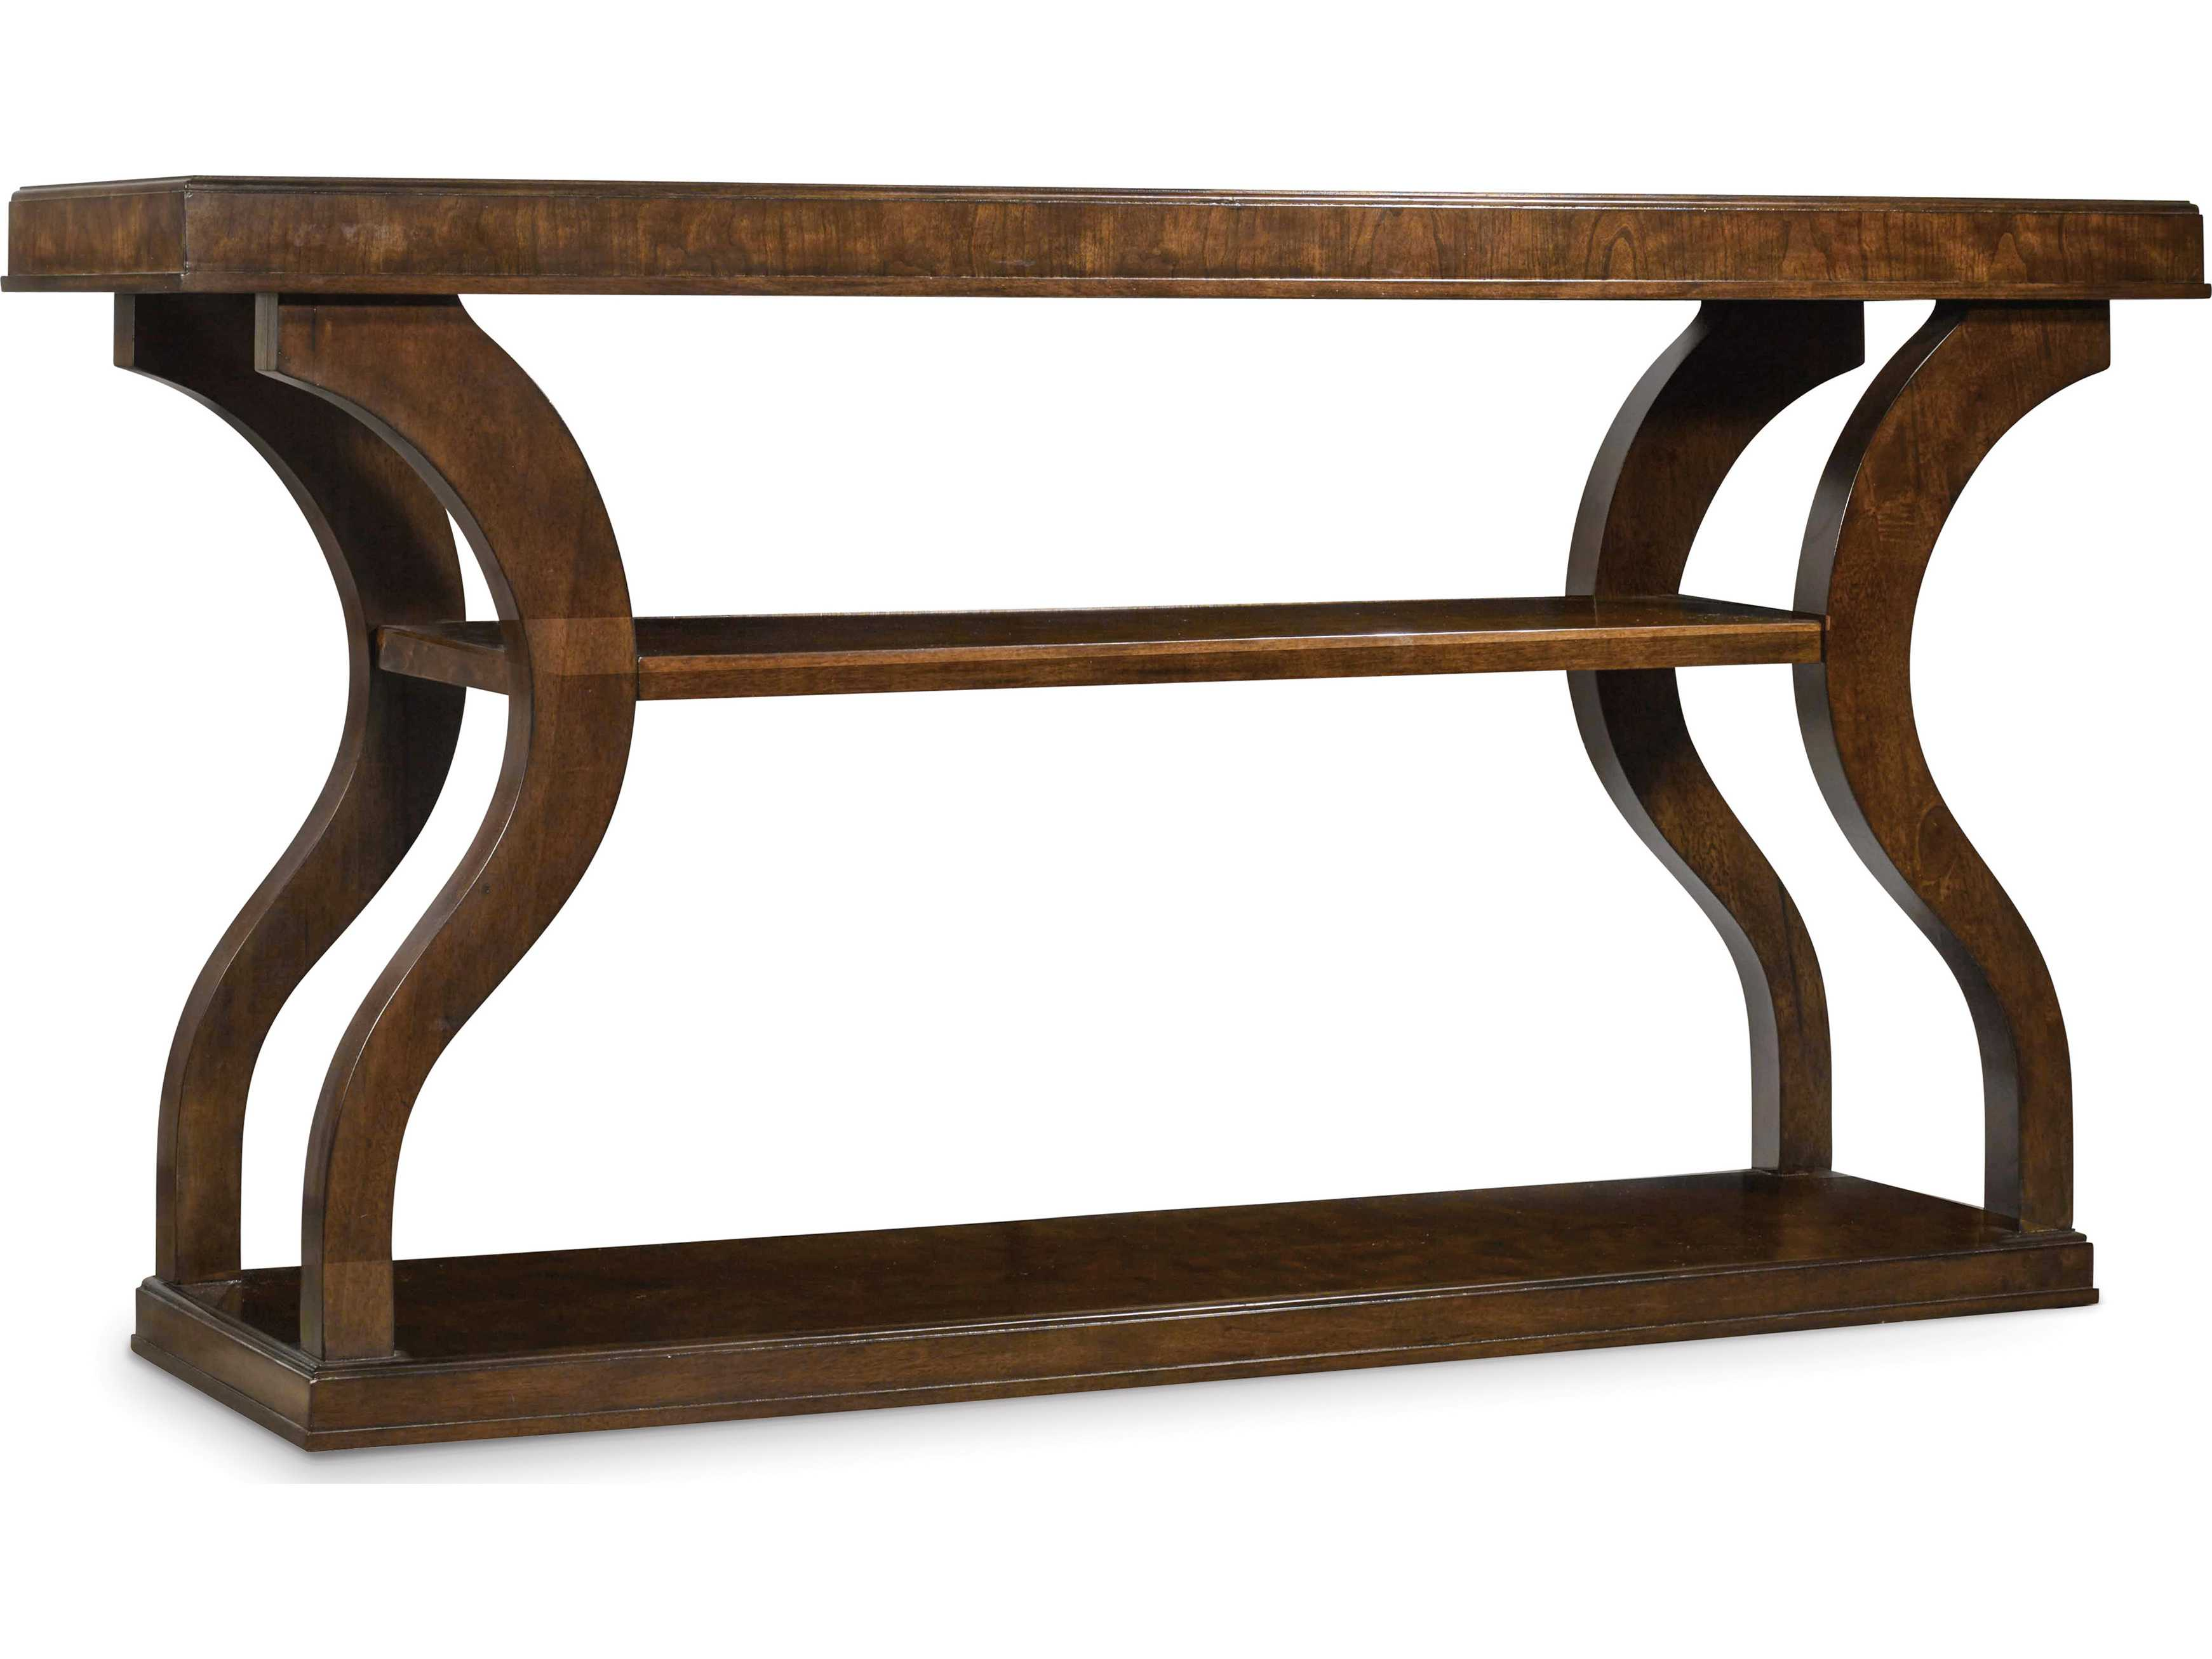 Hooker furniture skyline dark wood 65 39 39 l x 18 39 39 w for 65 sofa table